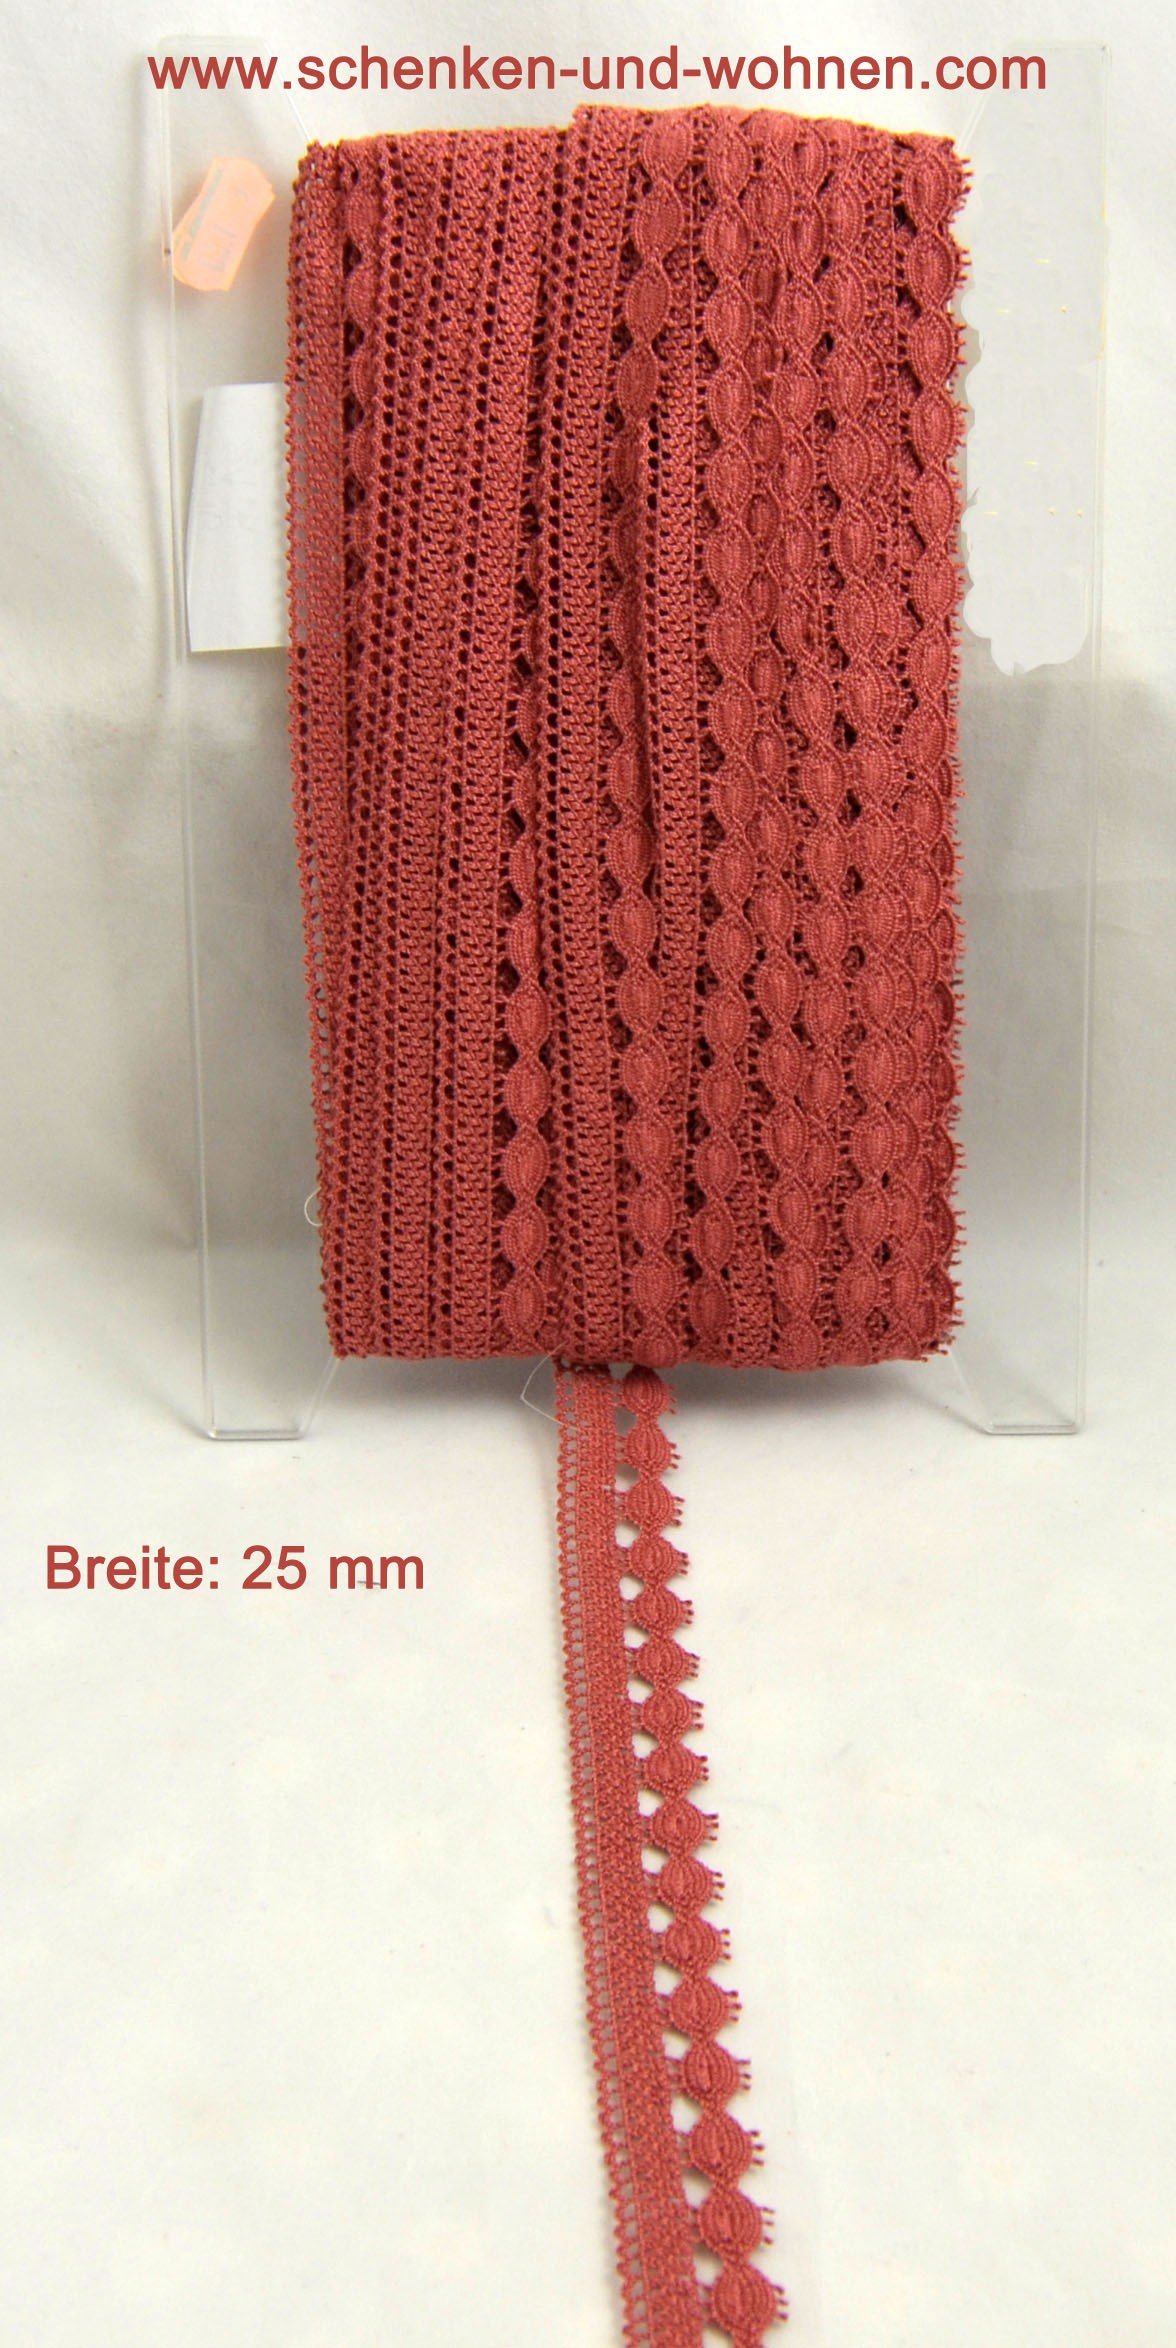 Baumwoll-Spitze Borte 25 mm breit rosenholz Bernau